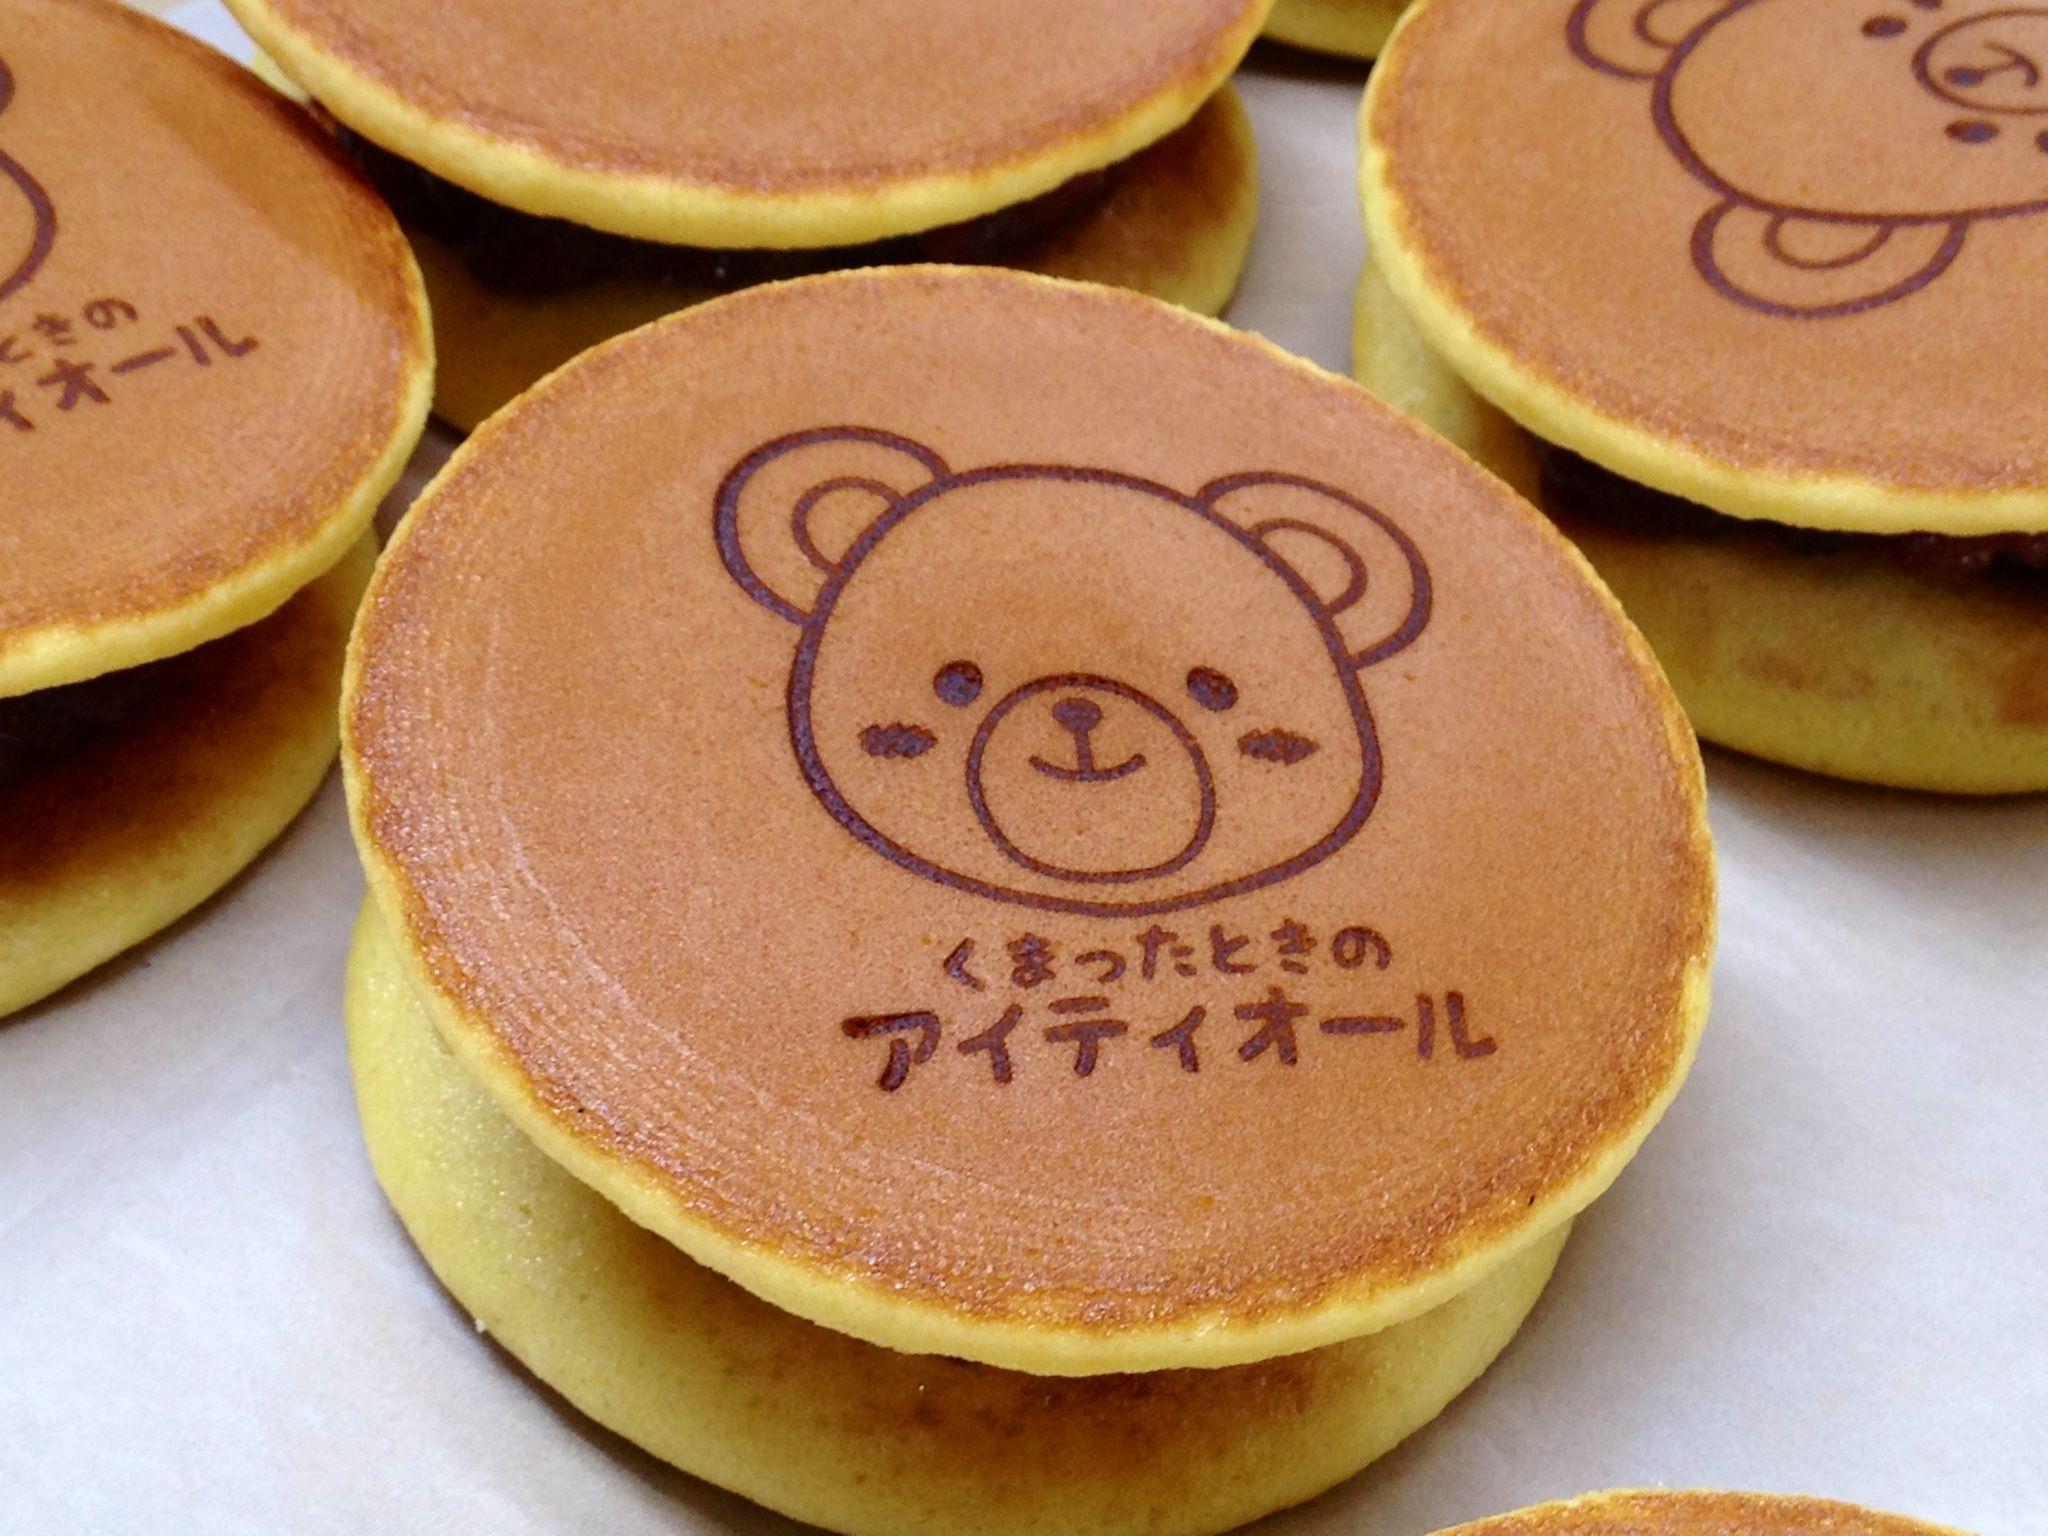 japanese sweets wagashi dorayaki logodora. どら焼き